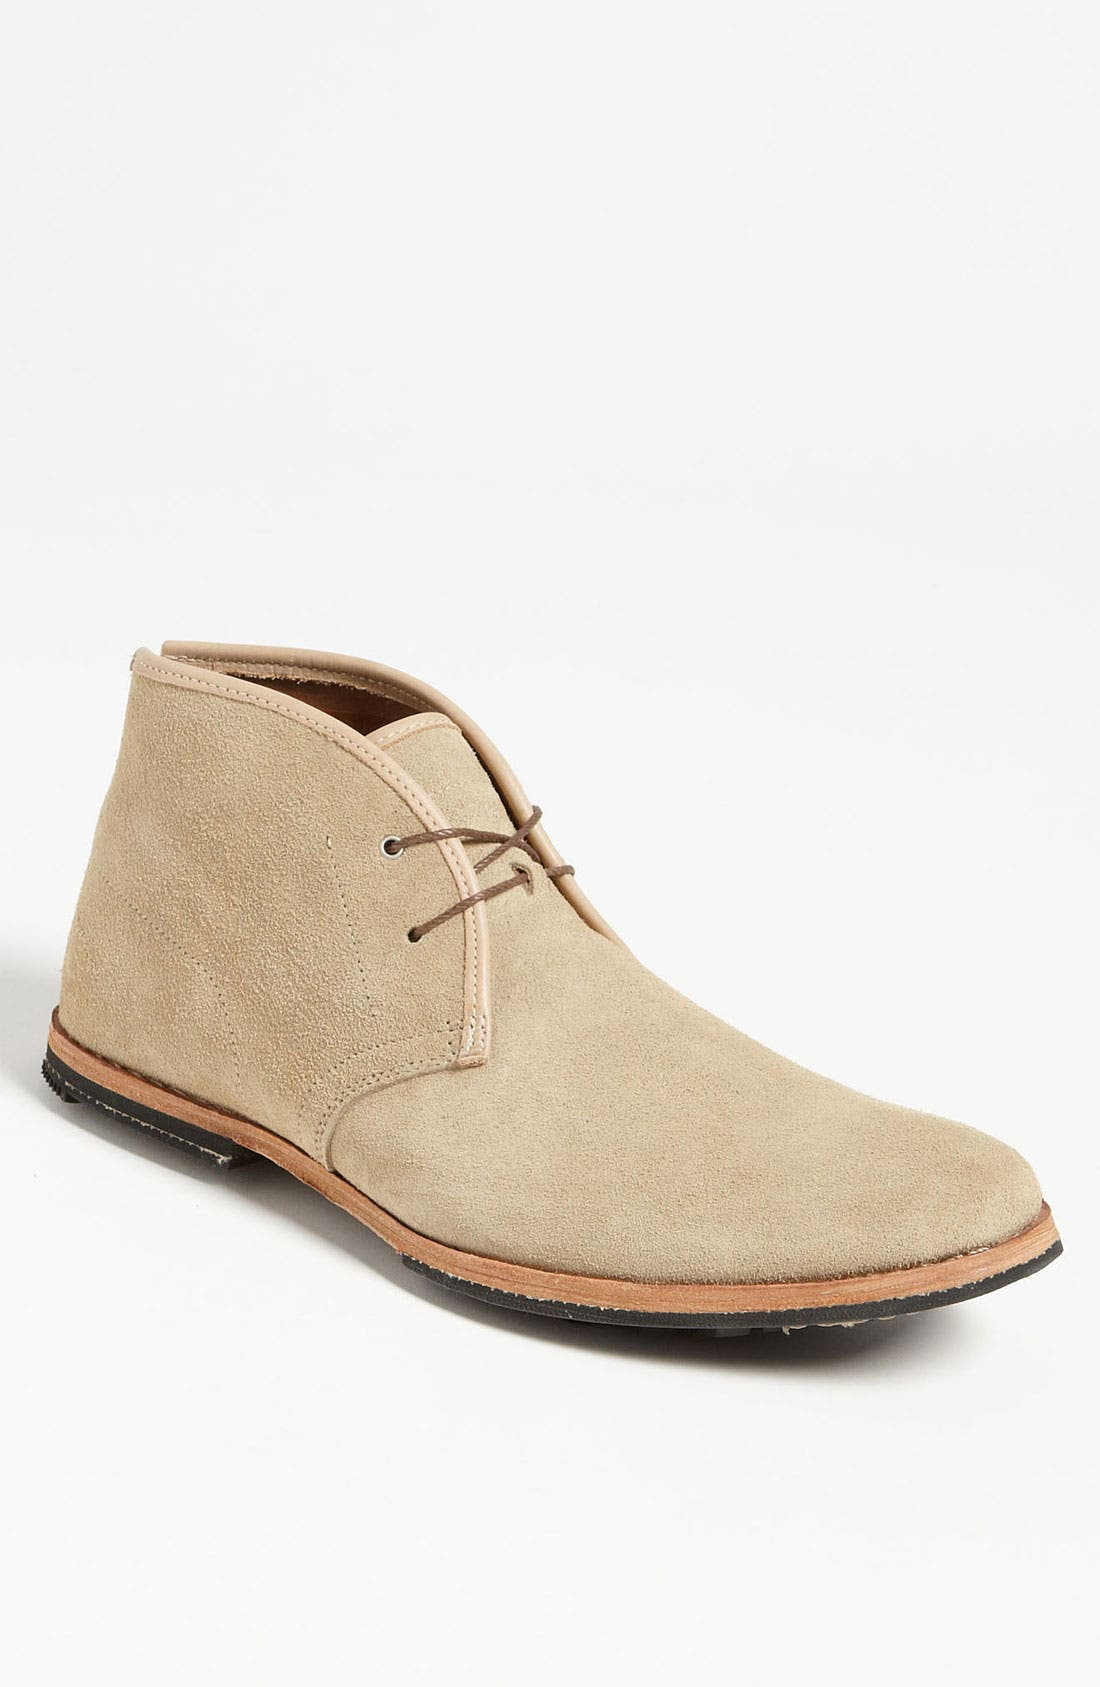 Main Image - Timberland Boot Company 'Wodehouse' Chukka Boot